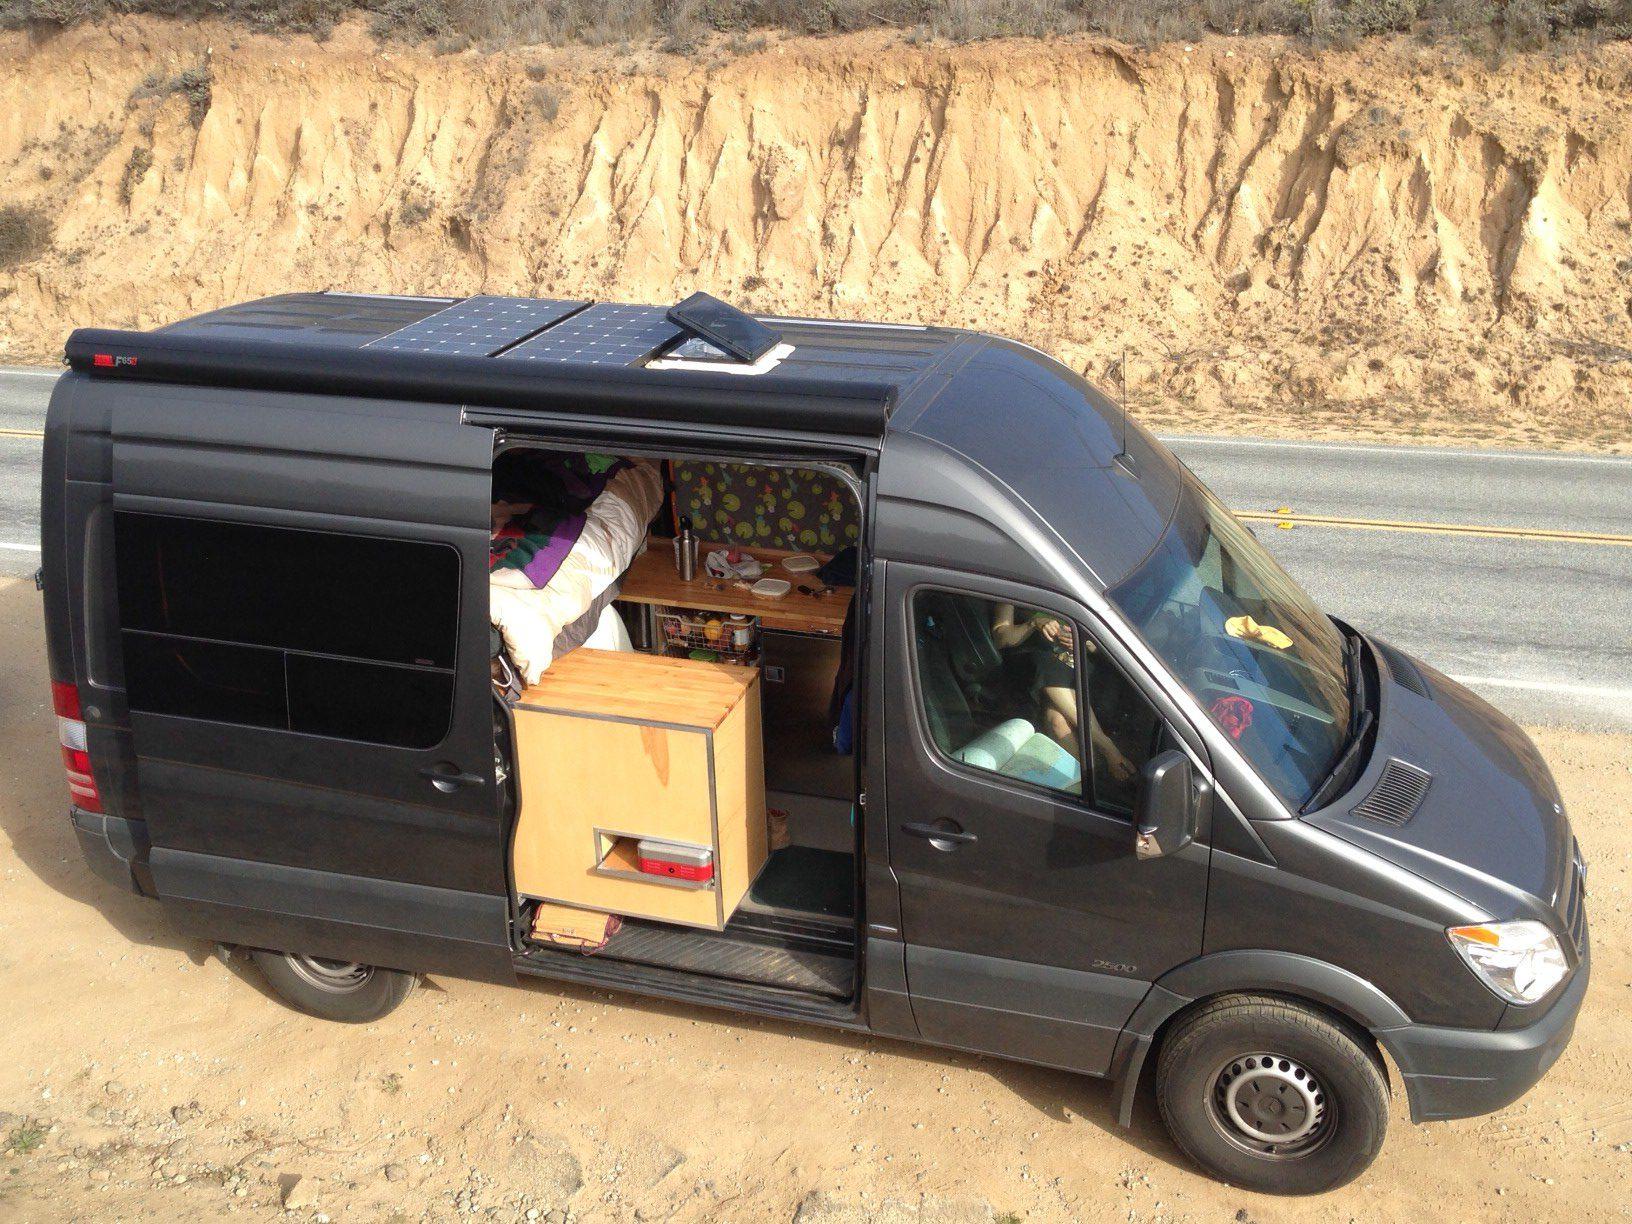 The Adventure Mobile Our Diy Sprinter Camper Van Bicycle